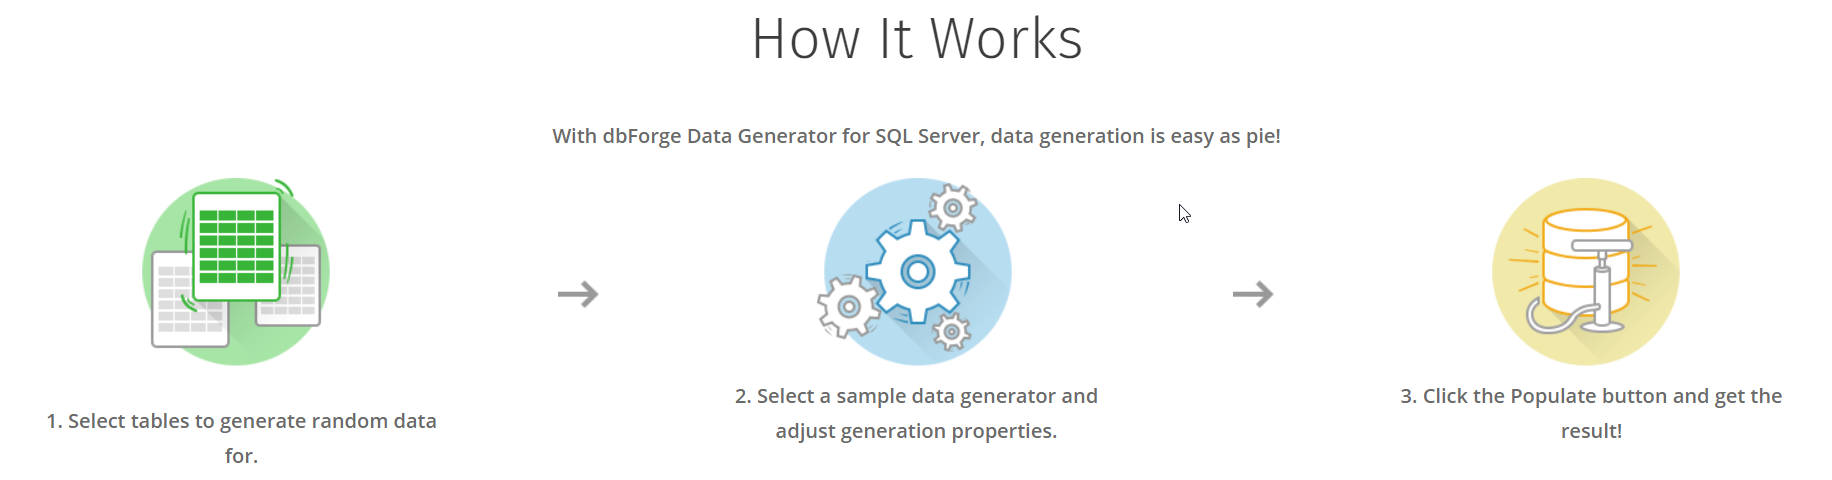 How dbForge Data Generator for SQL Server works